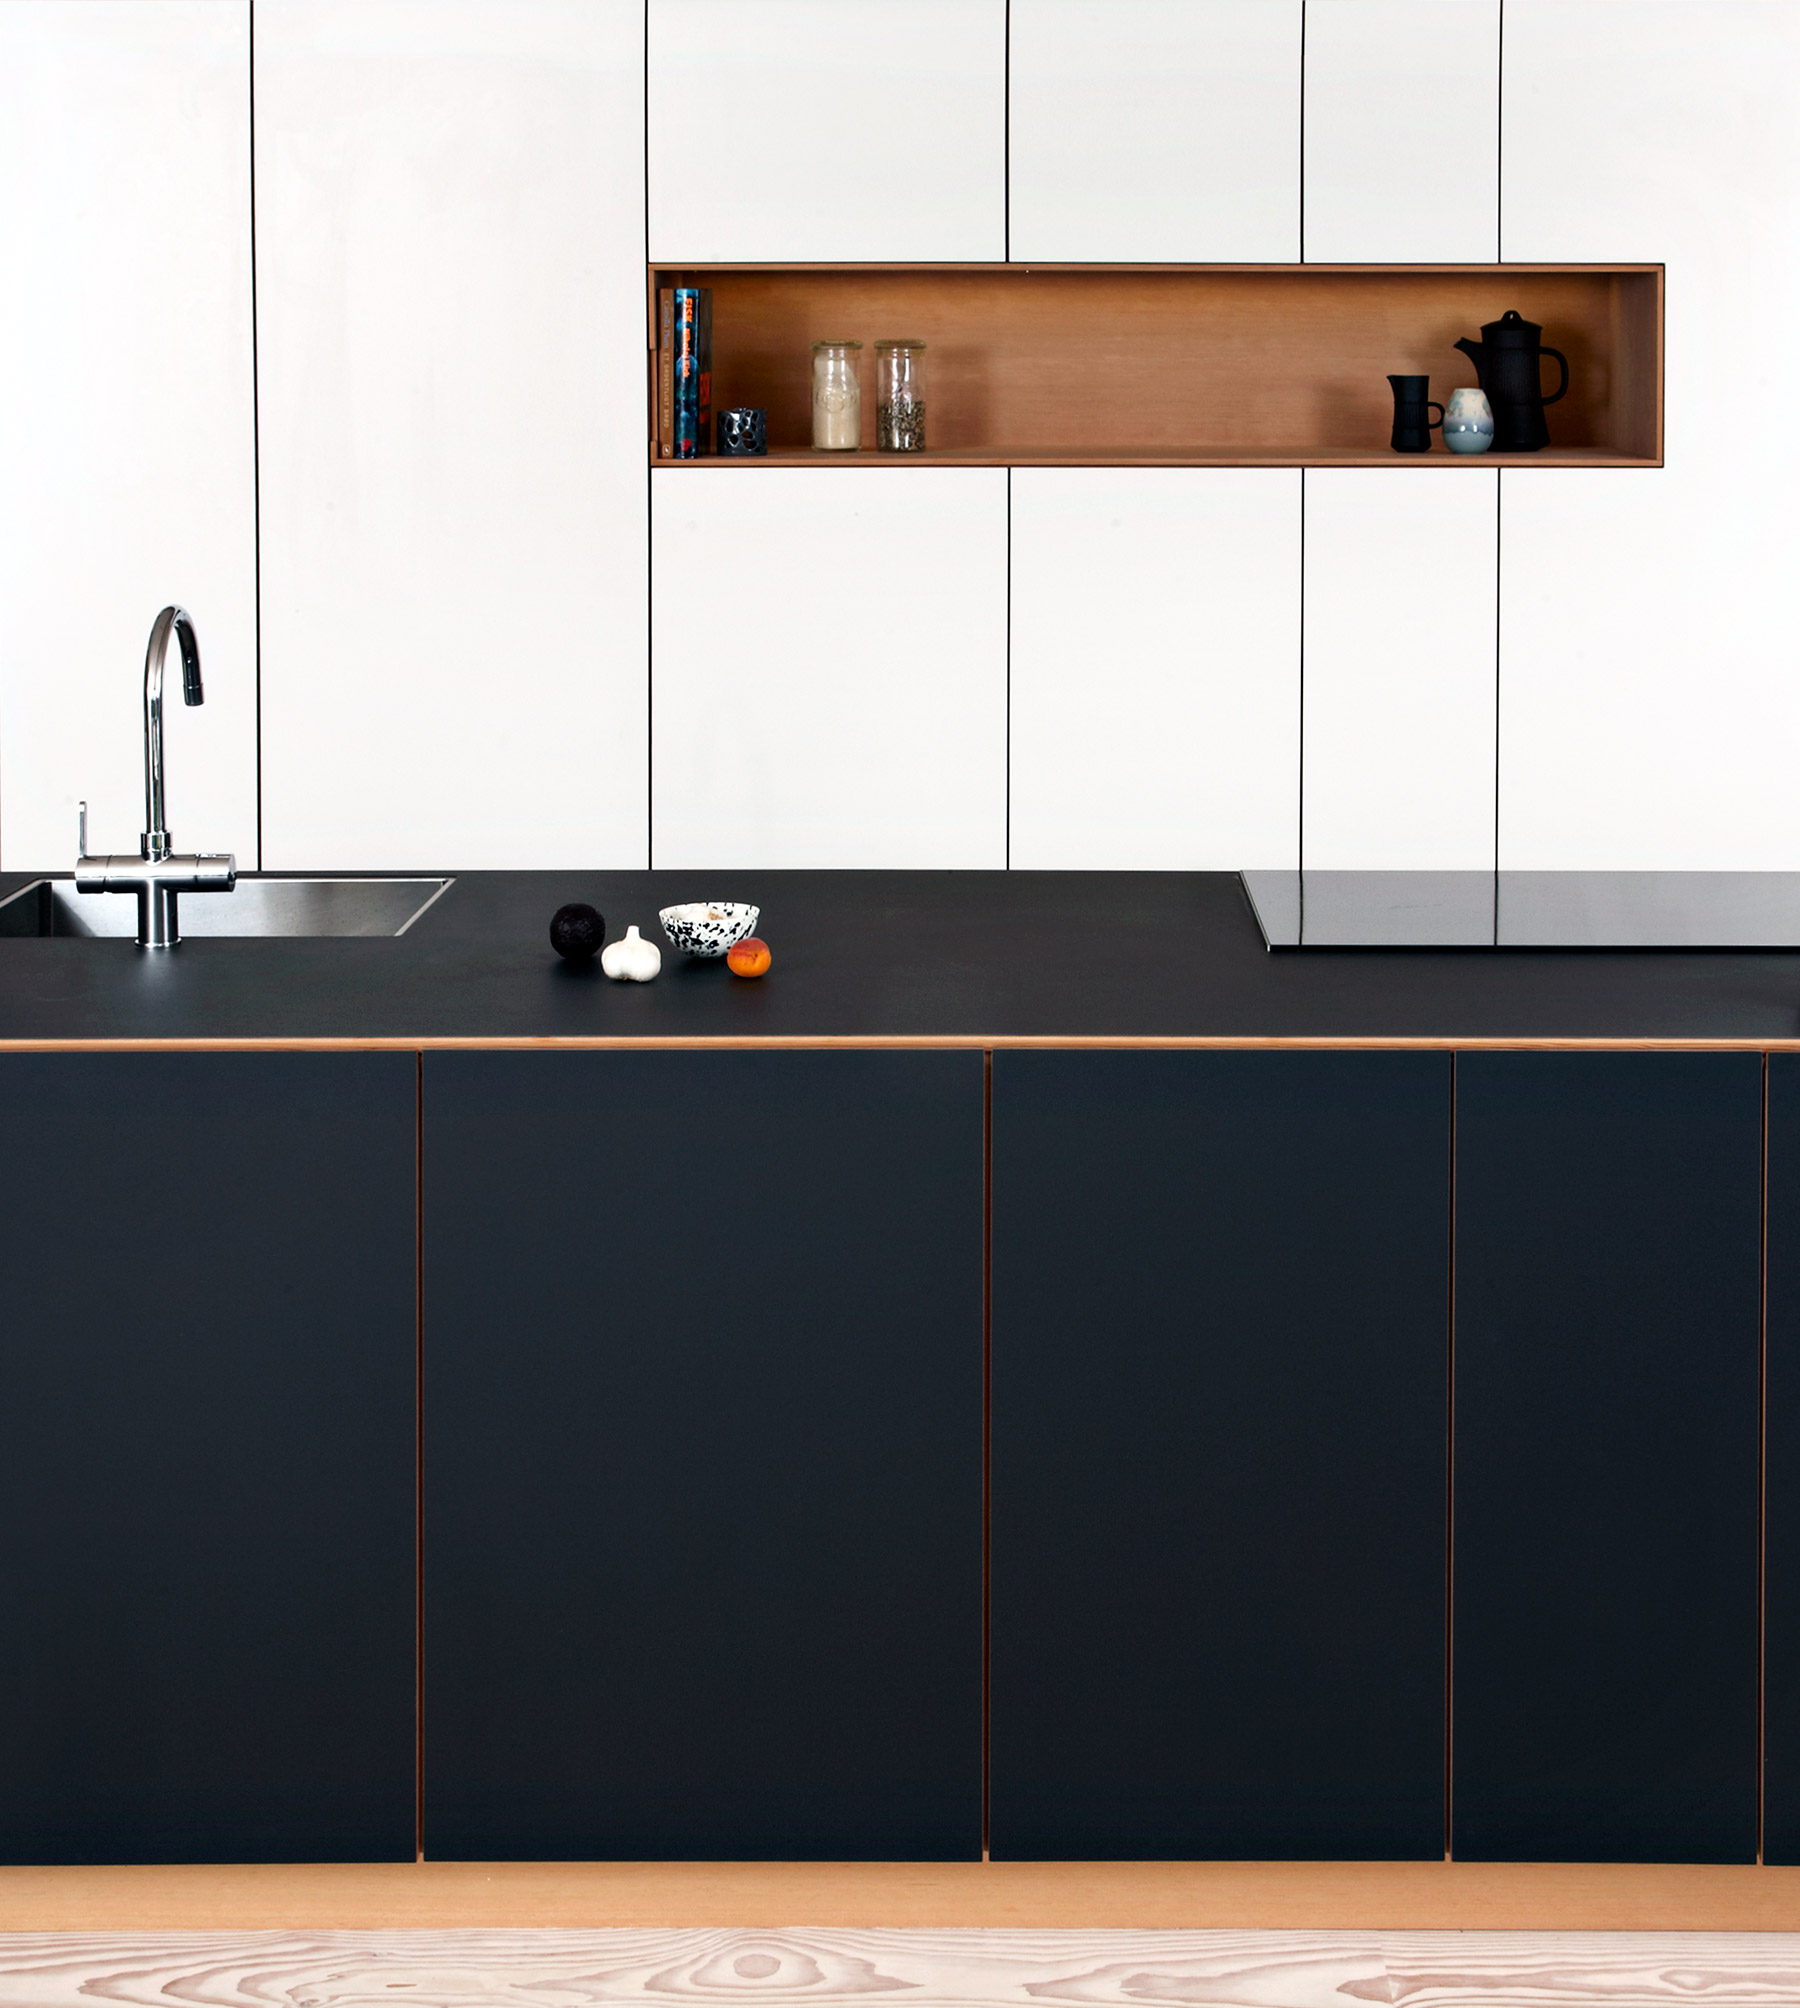 Minimalistic kitchen by Nicolaj Bo™